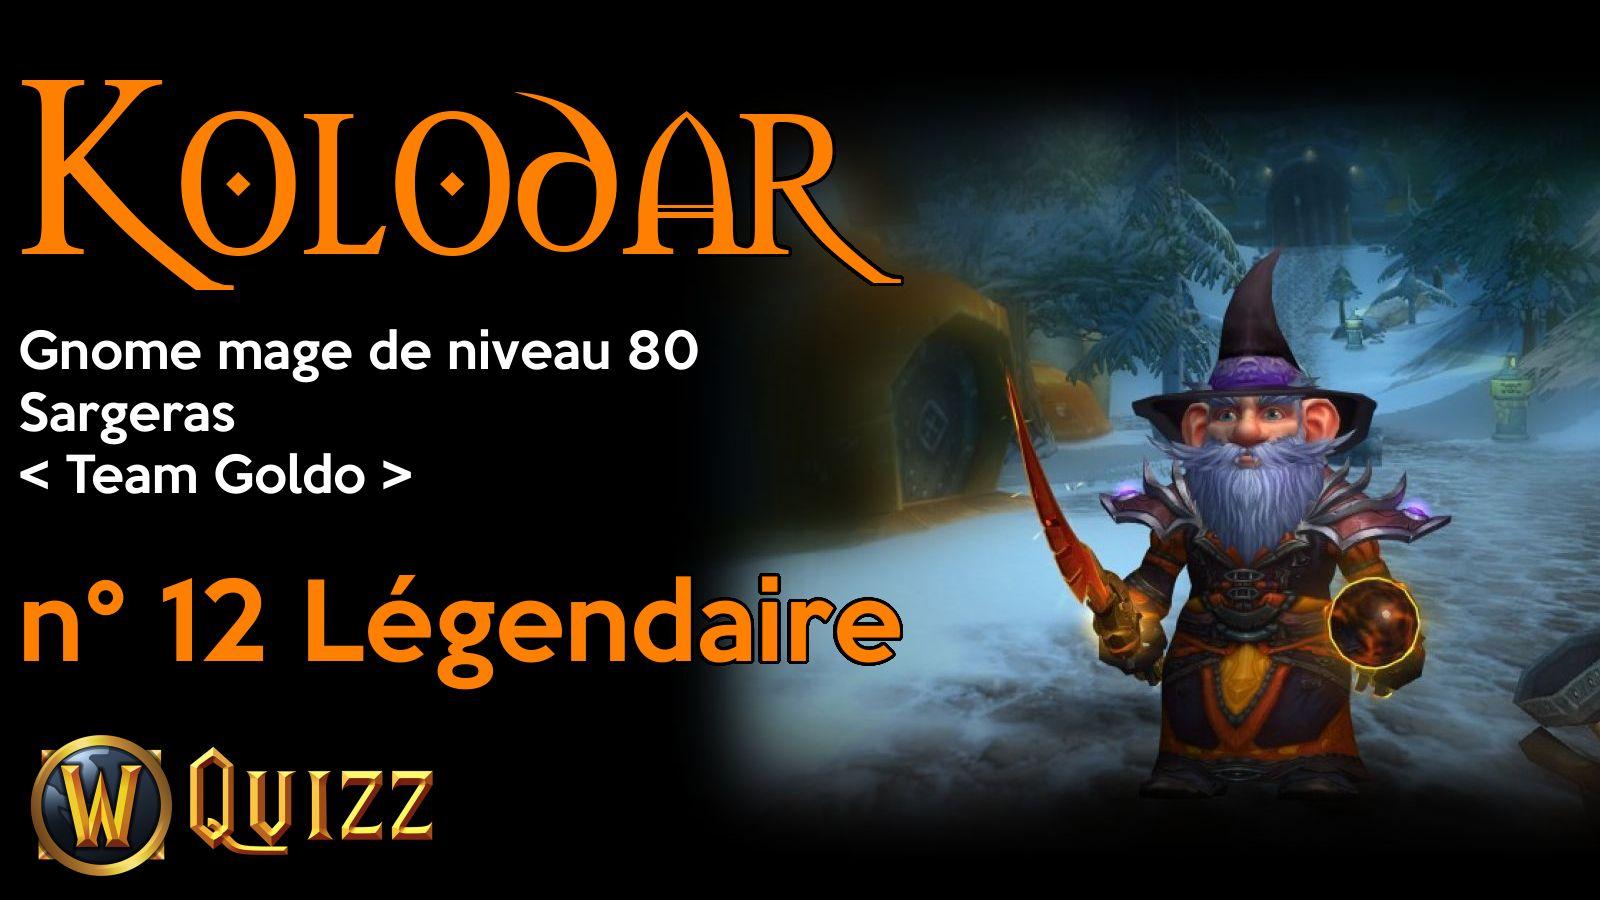 Kolodar, Gnome mage de niveau 80, Sargeras